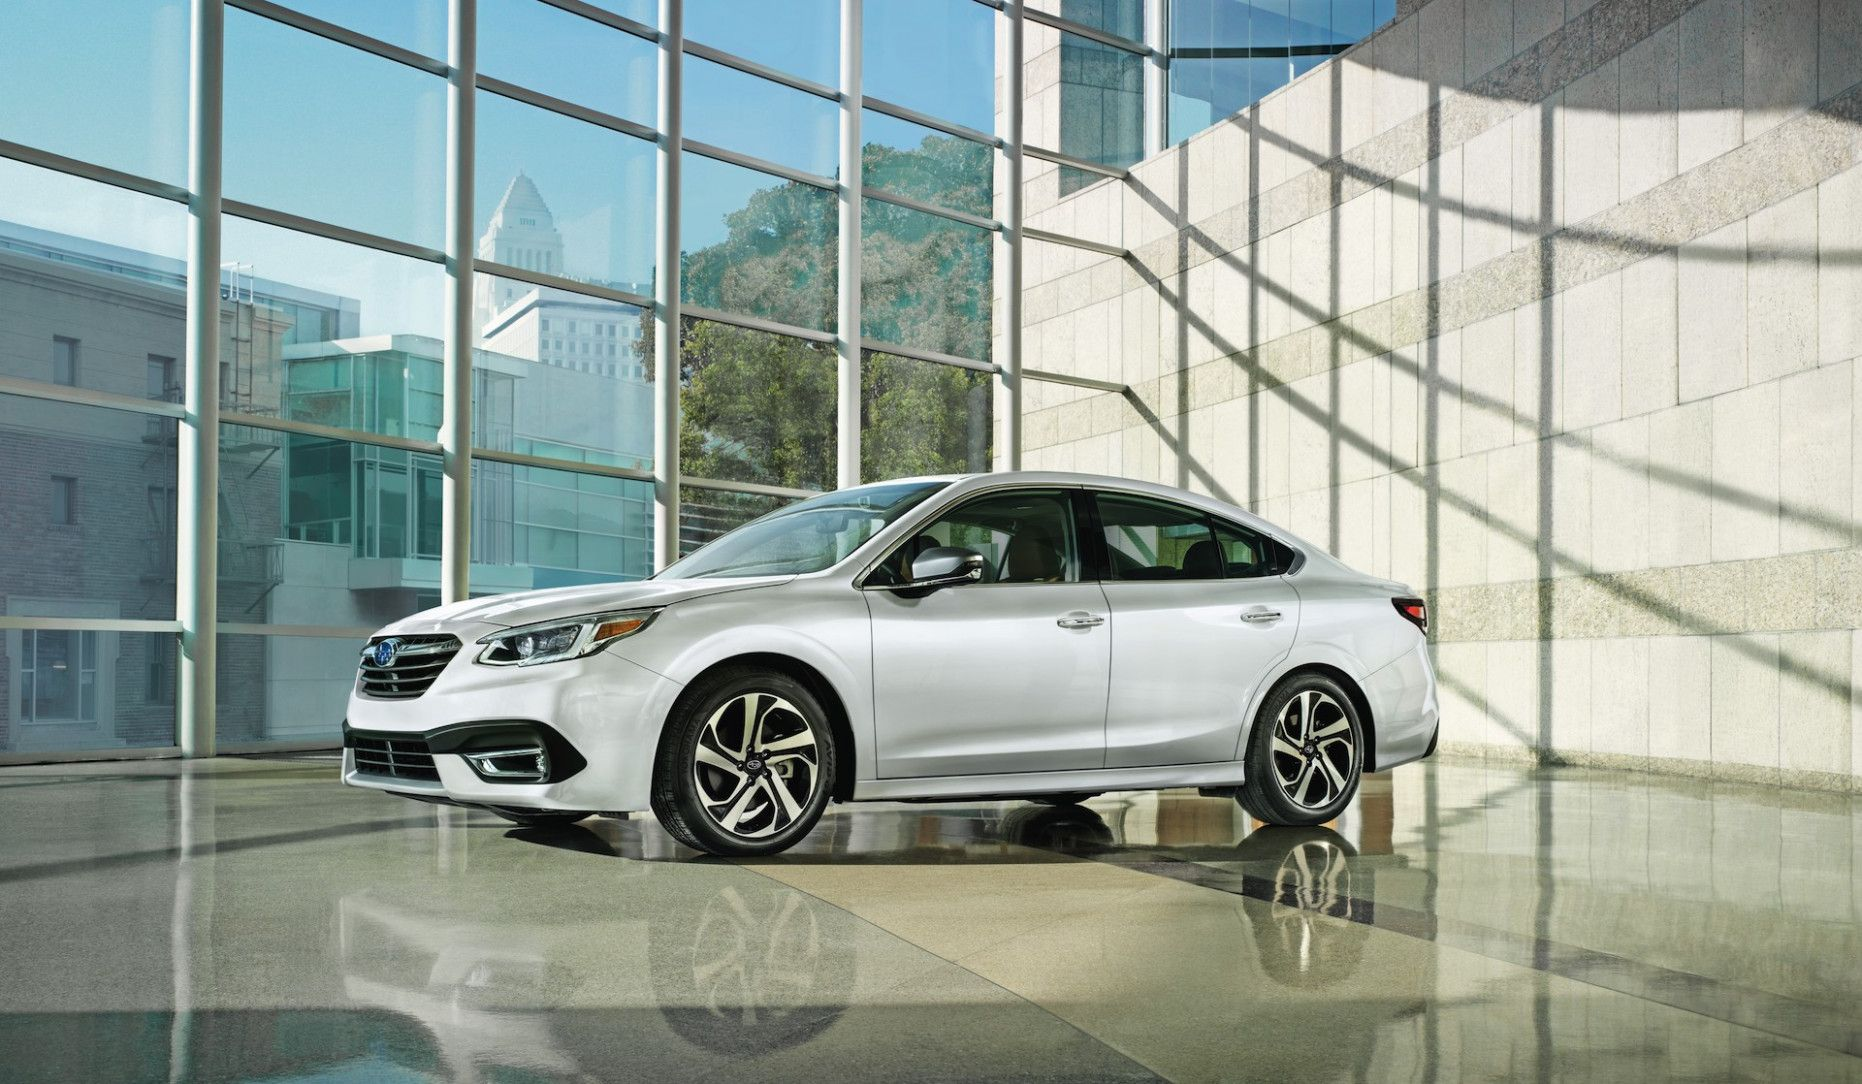 2020 Subaru Brochure in 2020 | Subaru legacy, Subaru ...